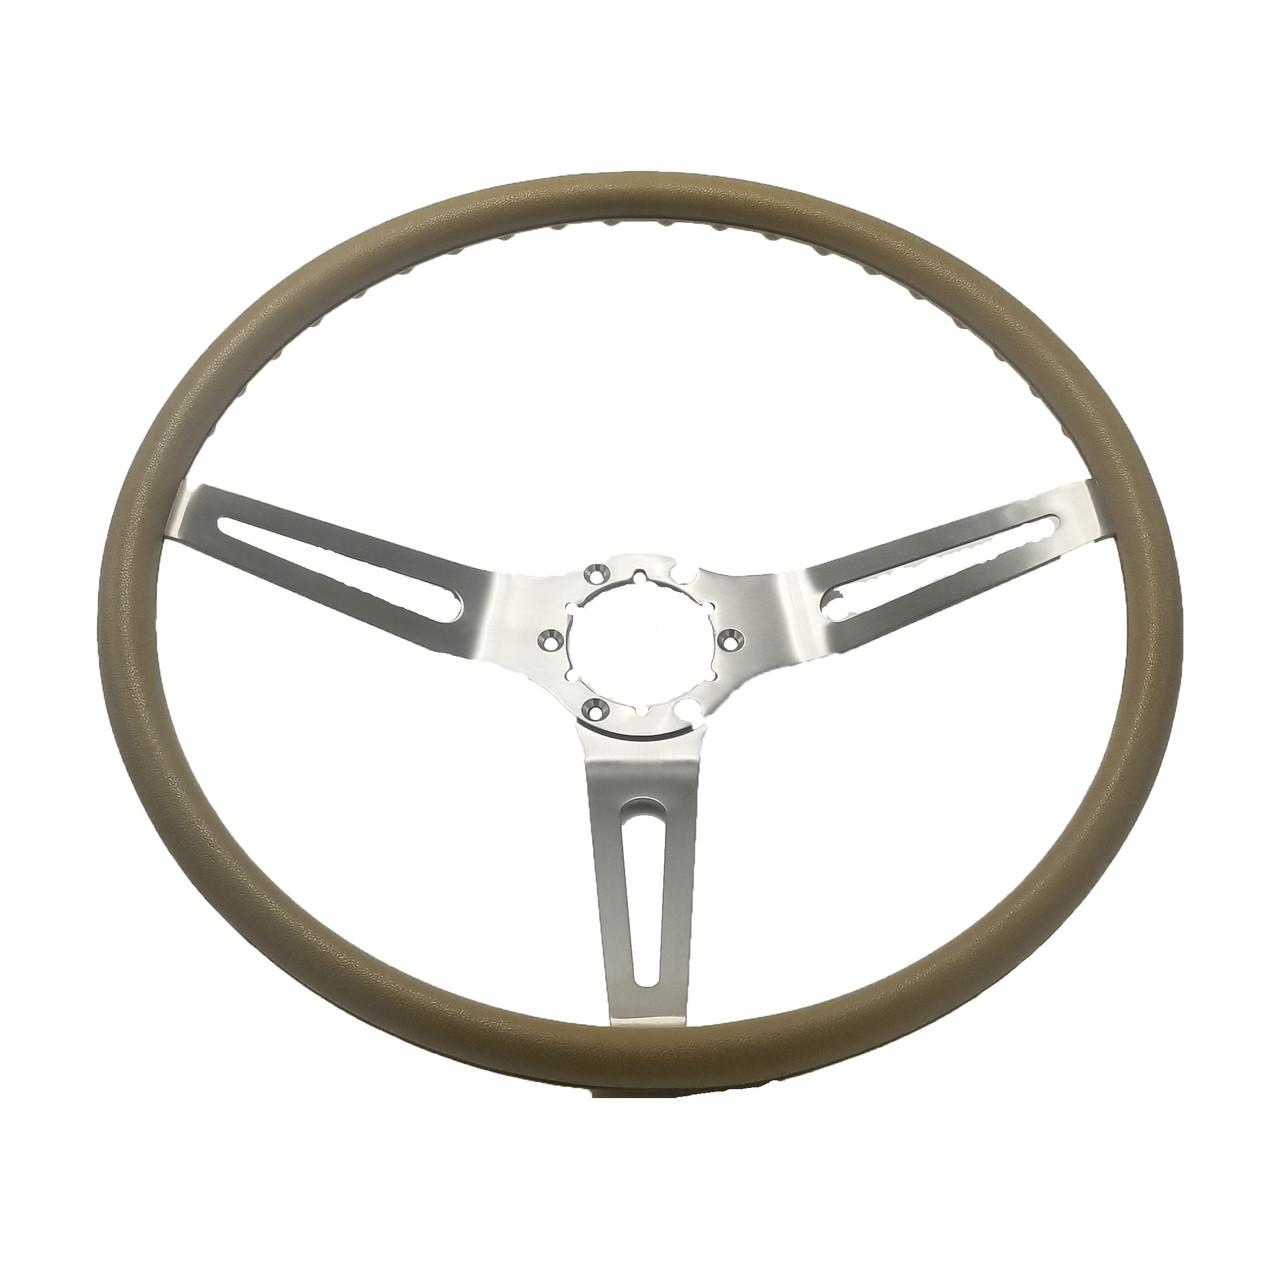 1970 Saddle 3-Spoke Steering Wheel (only)